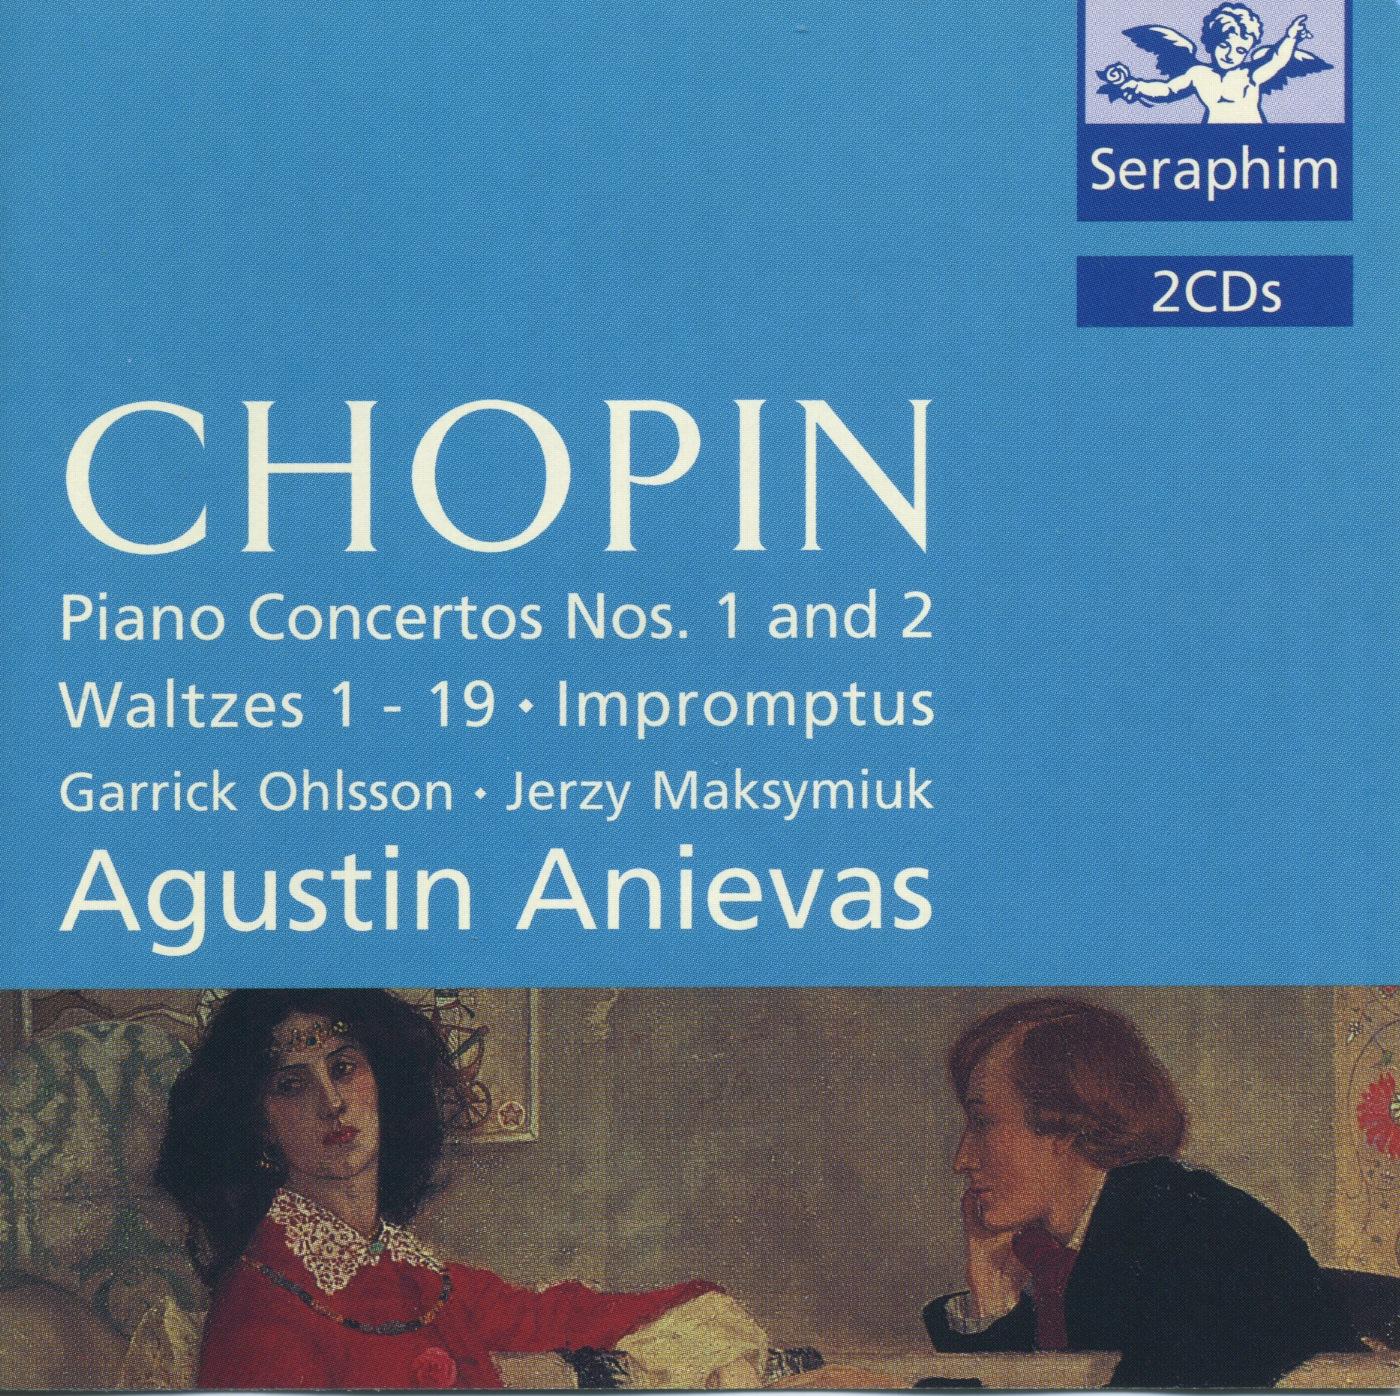 Chopin.jpeg